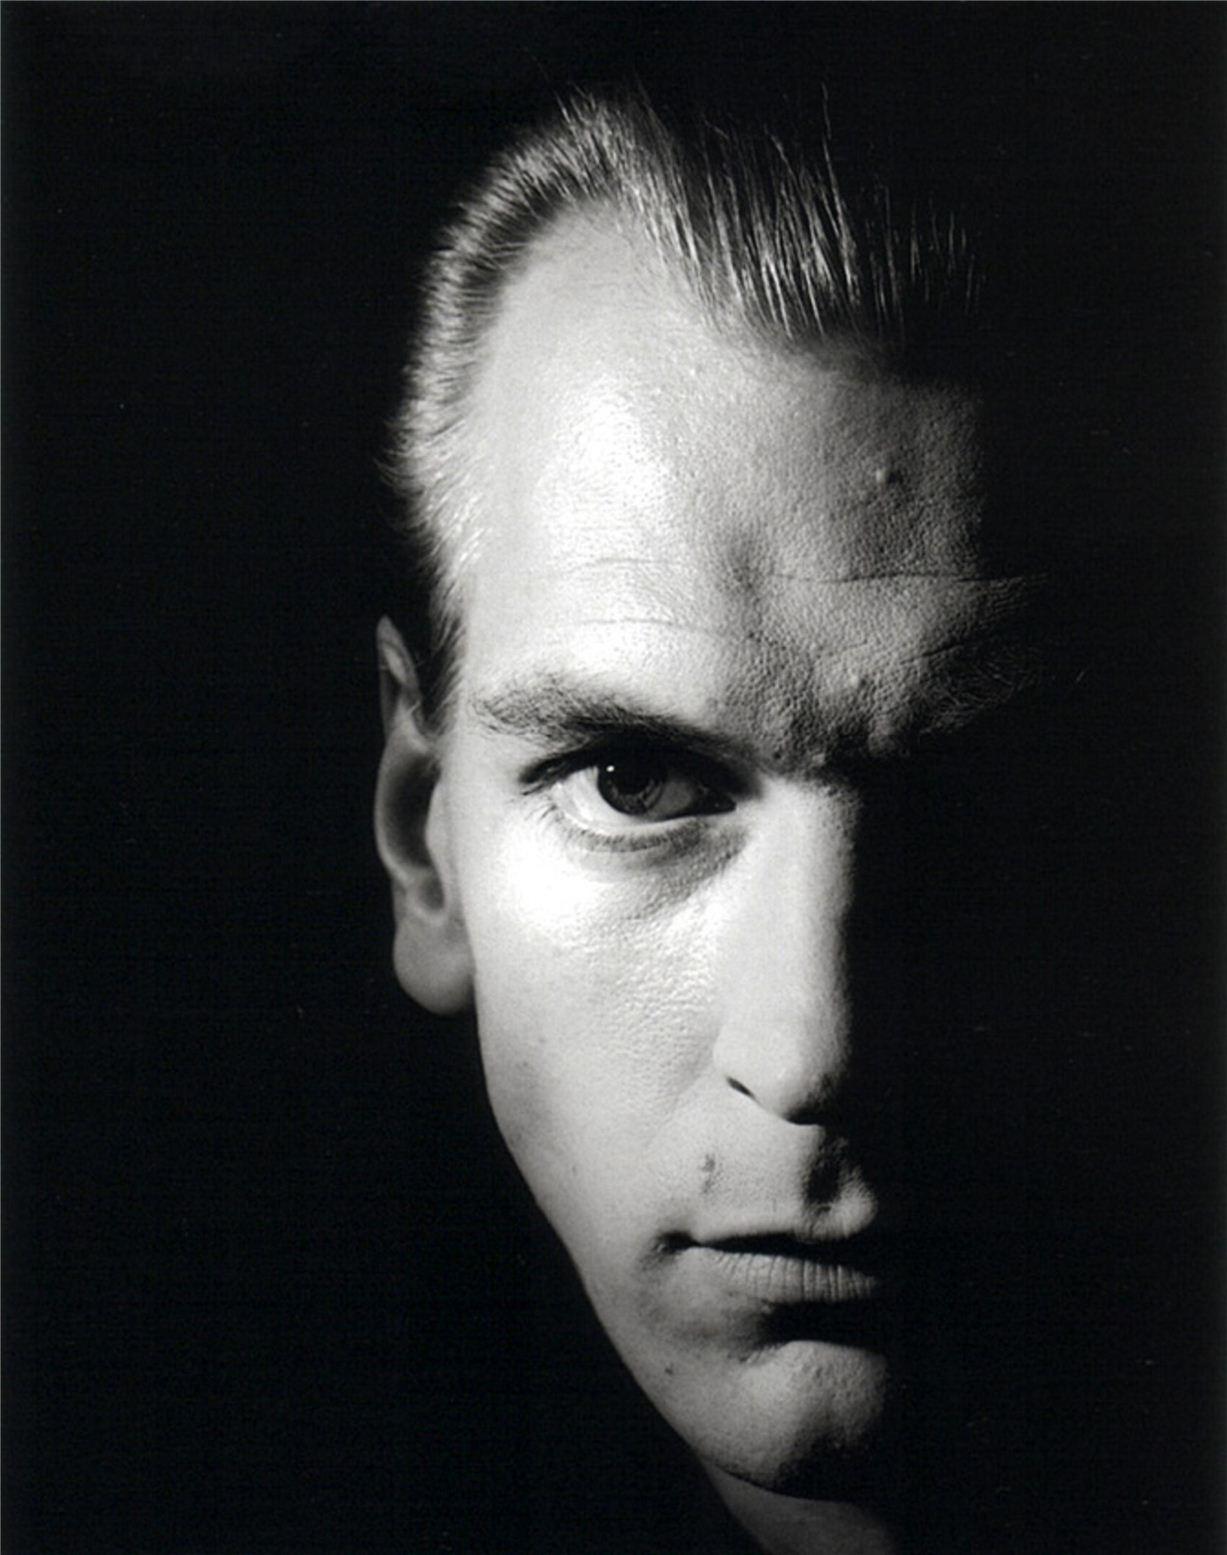 Jullian Sands / Джулиан Сэндс - портрет фотографа Грега Гормана / Greg Gorman